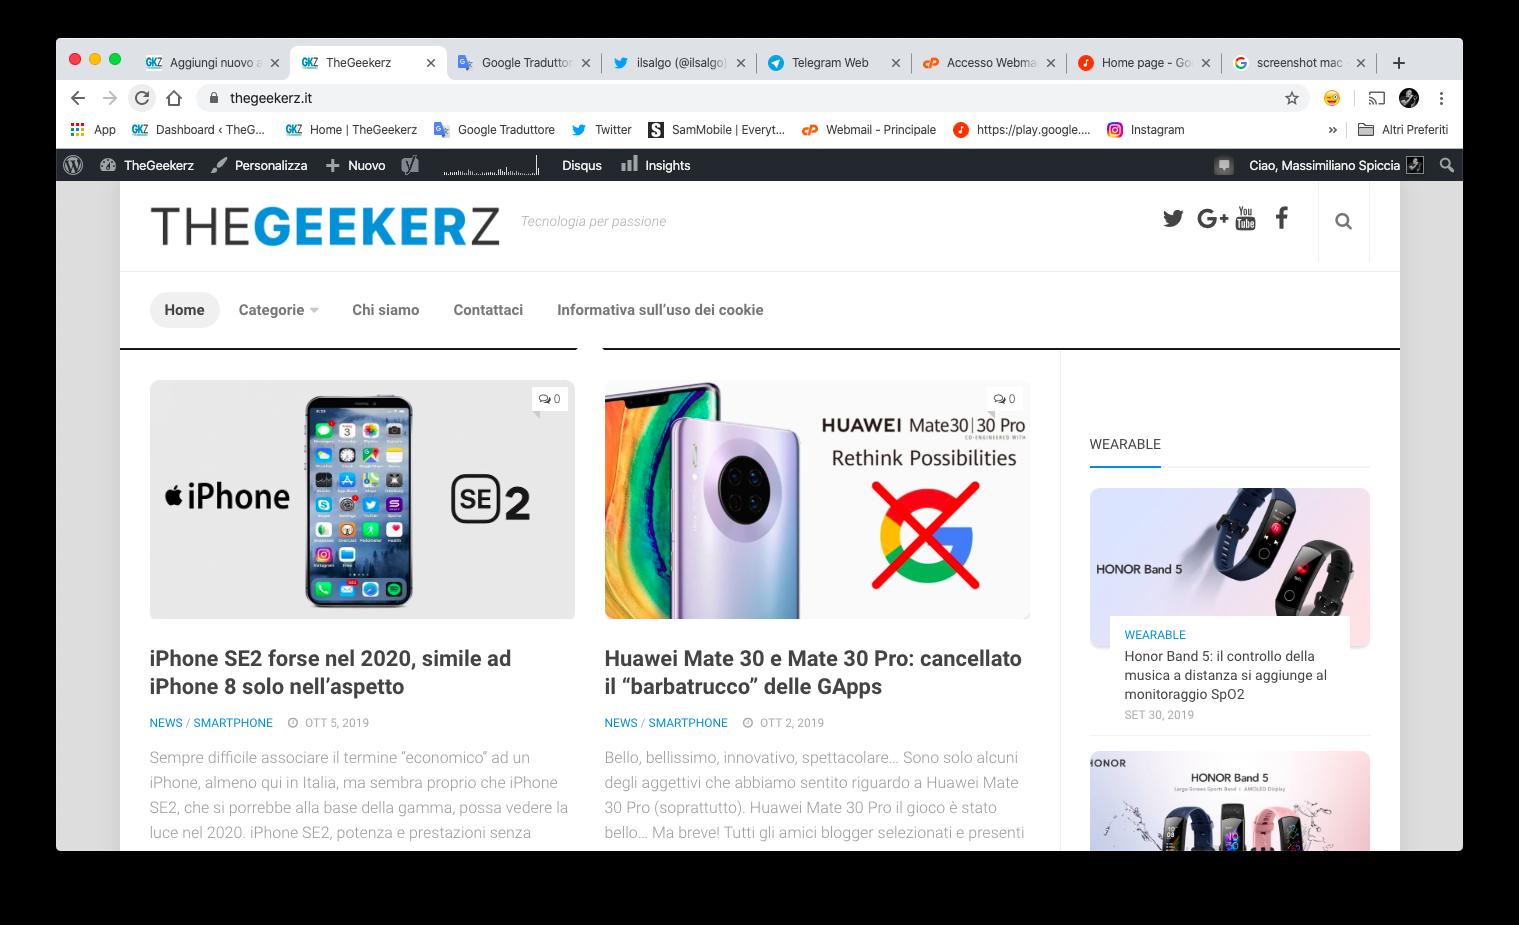 The Geekerz